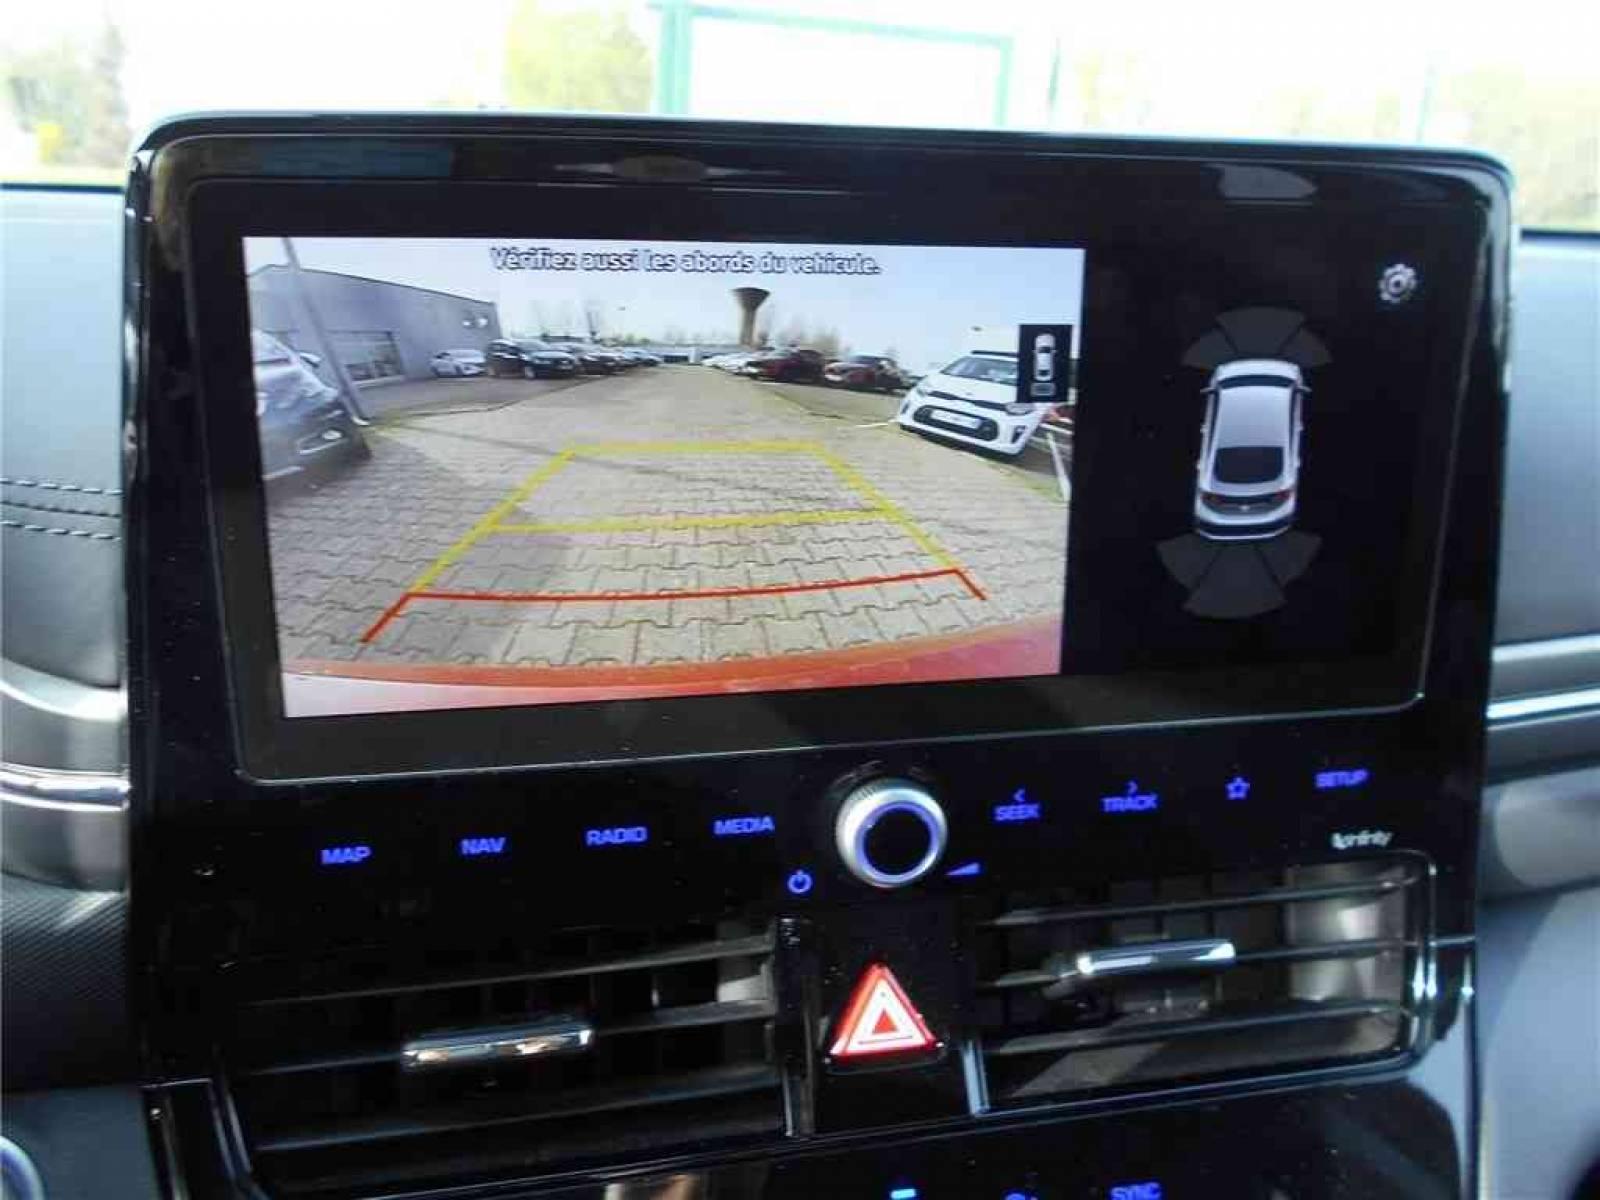 HYUNDAI Ioniq Plug-in 141 ch - véhicule d'occasion - Groupe Guillet - Chalon Automobiles - 71100 - Chalon-sur-Saône - 17